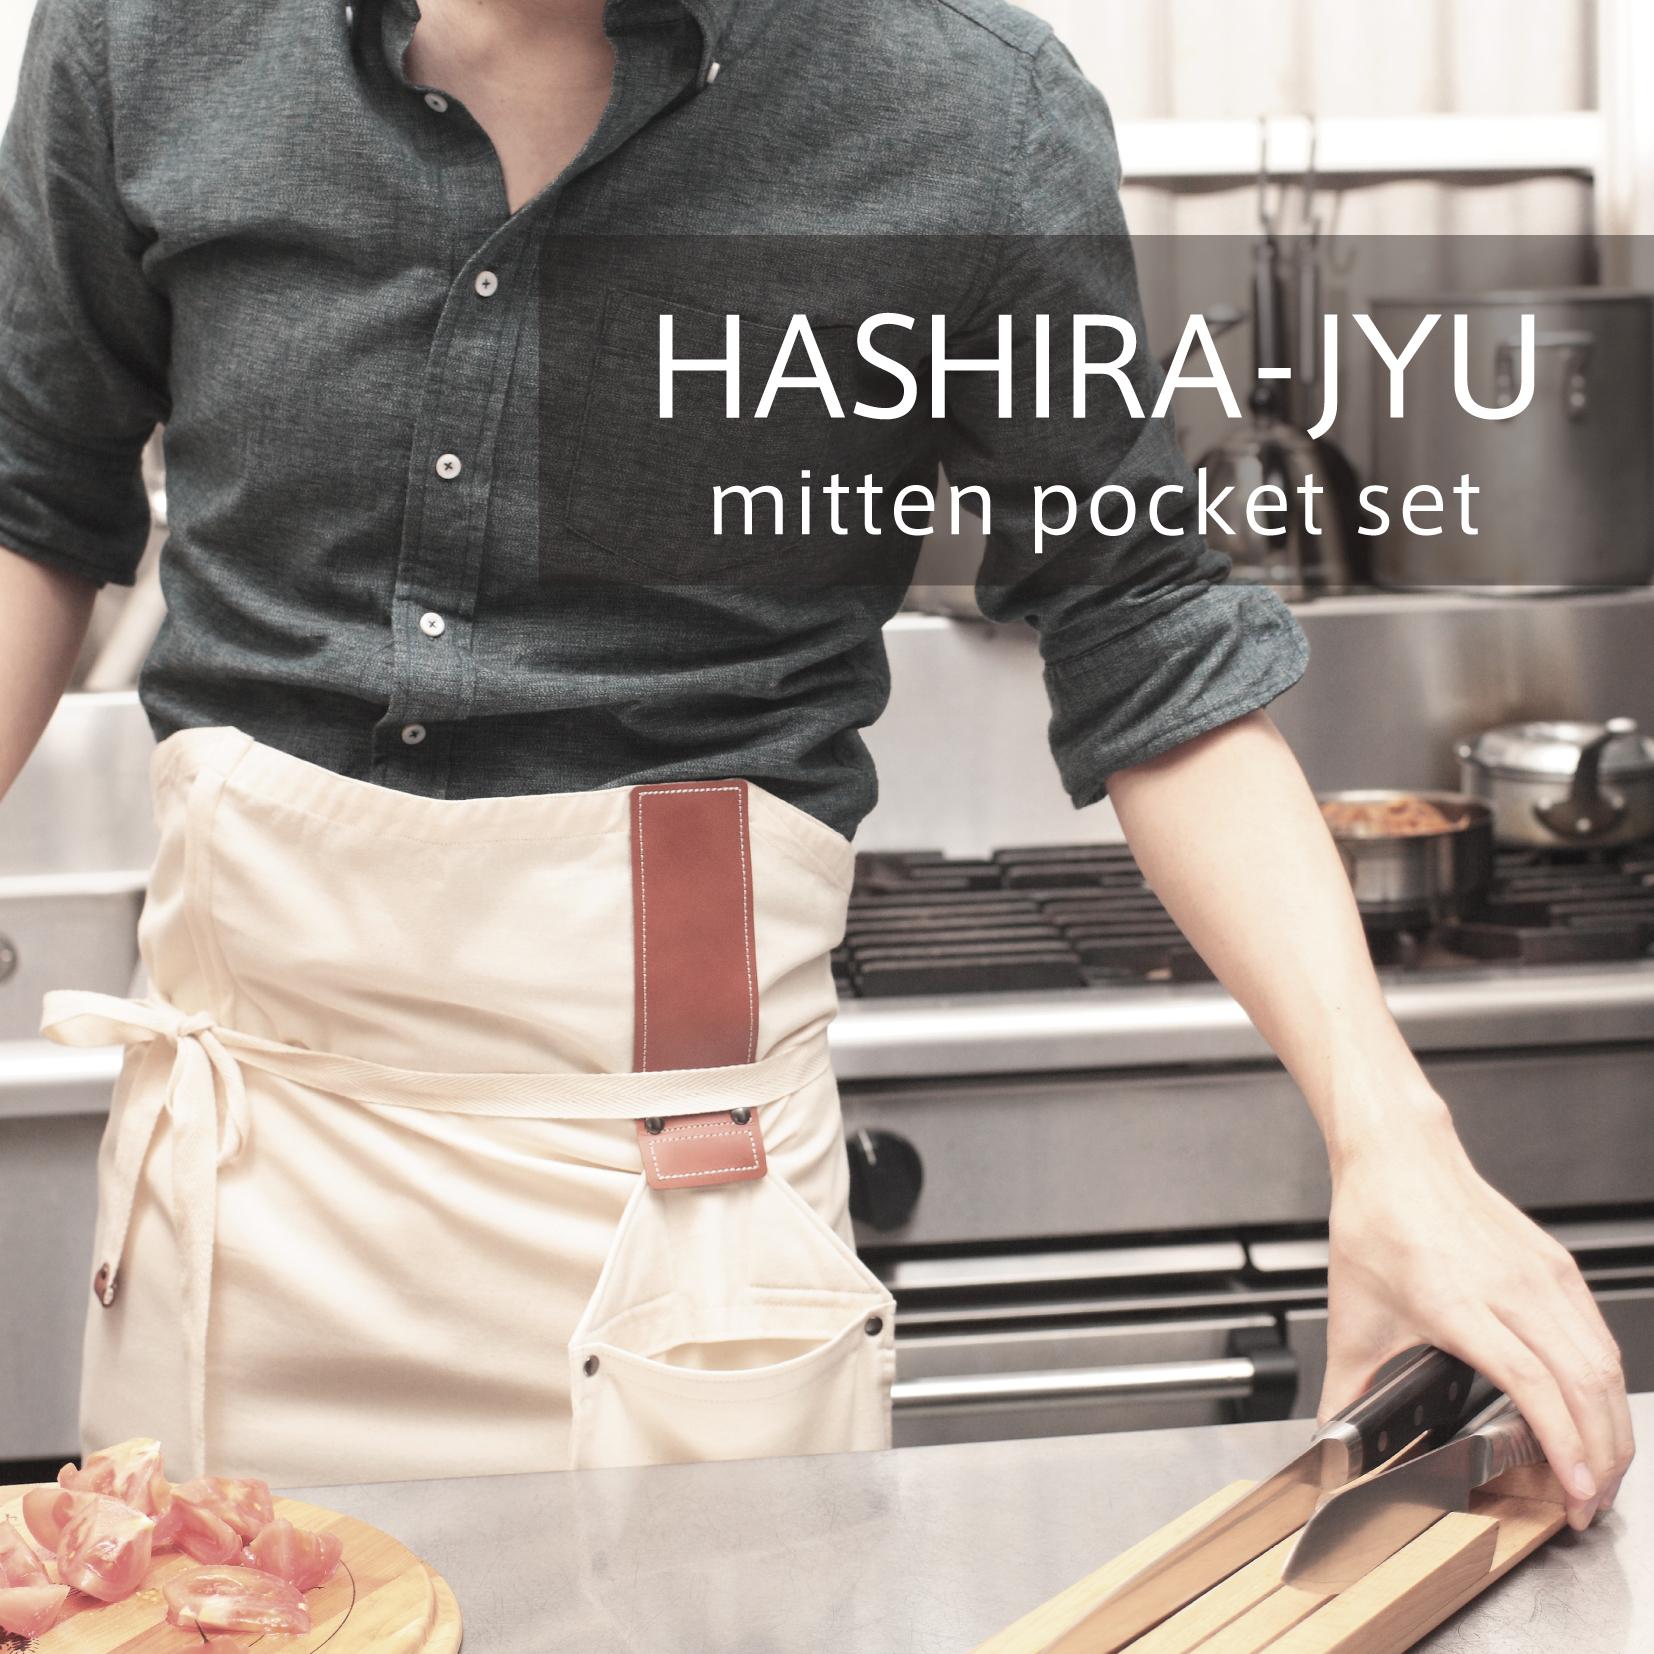 HASHIRA-JYU mitten pocket set